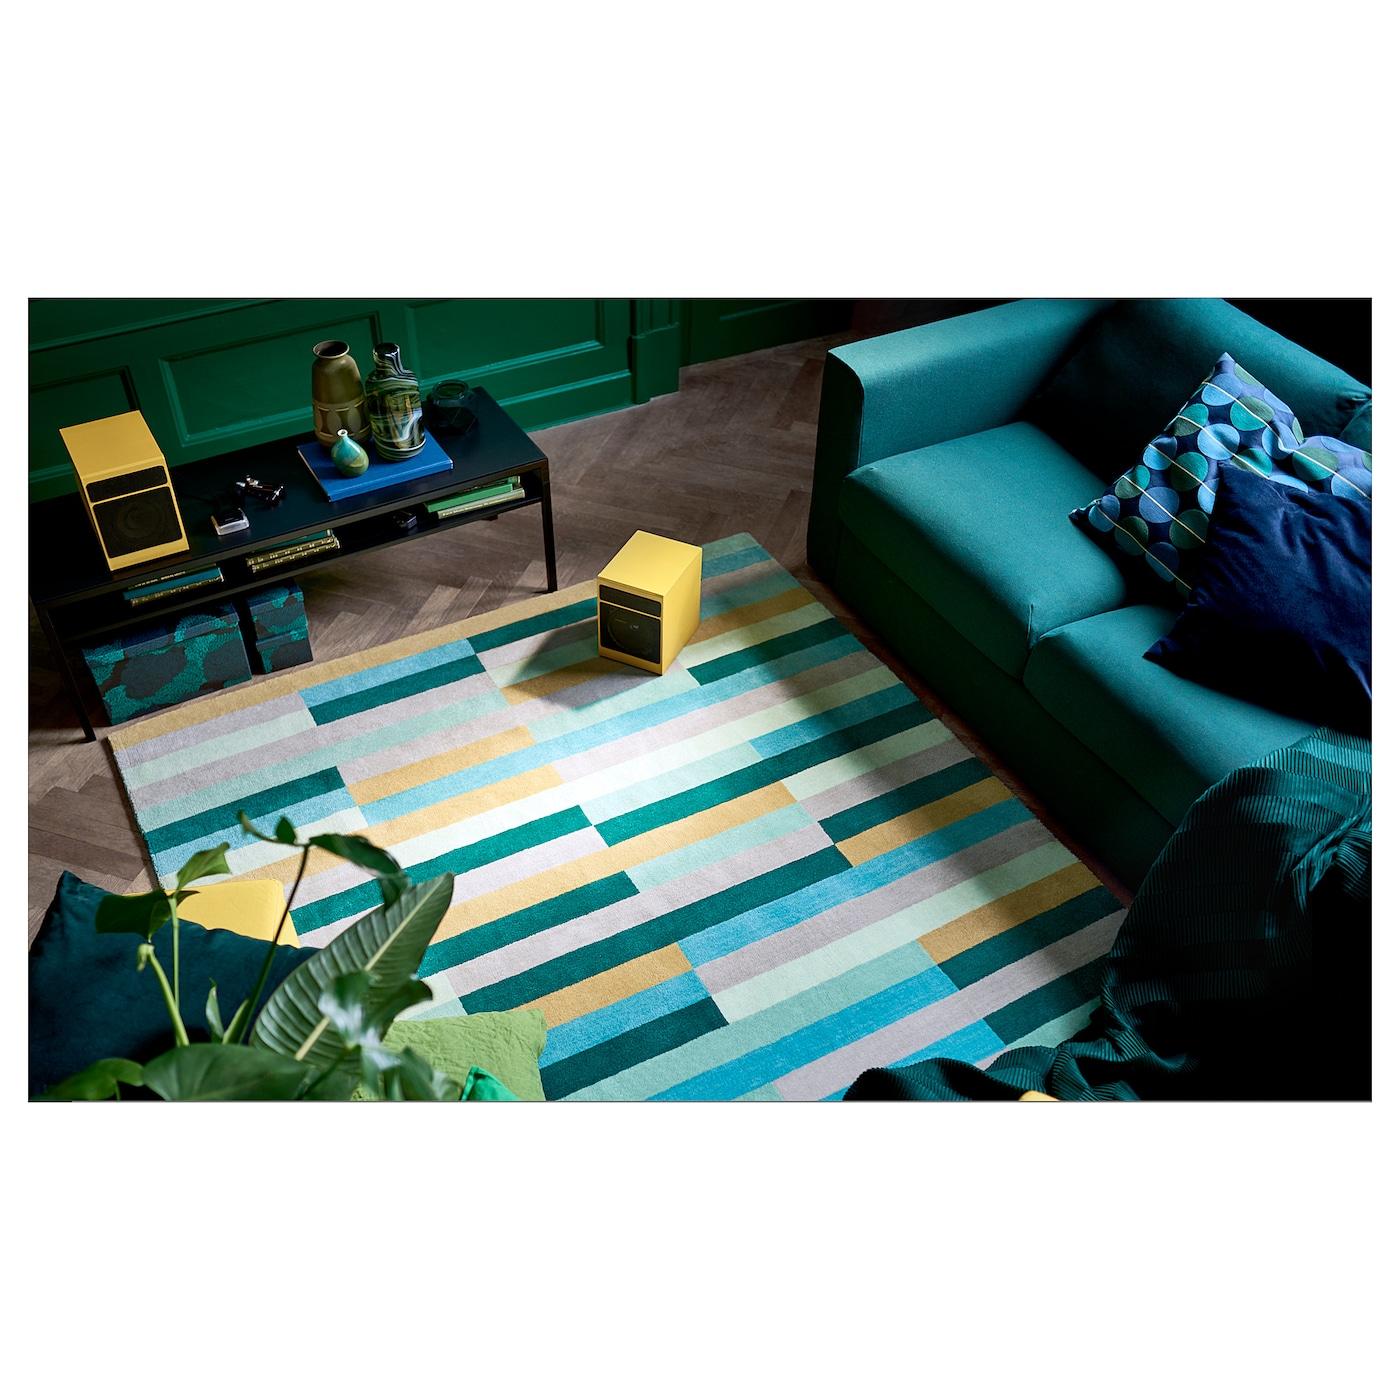 kr nge tapis poils ras fait main multicolore 170x240 cm ikea. Black Bedroom Furniture Sets. Home Design Ideas